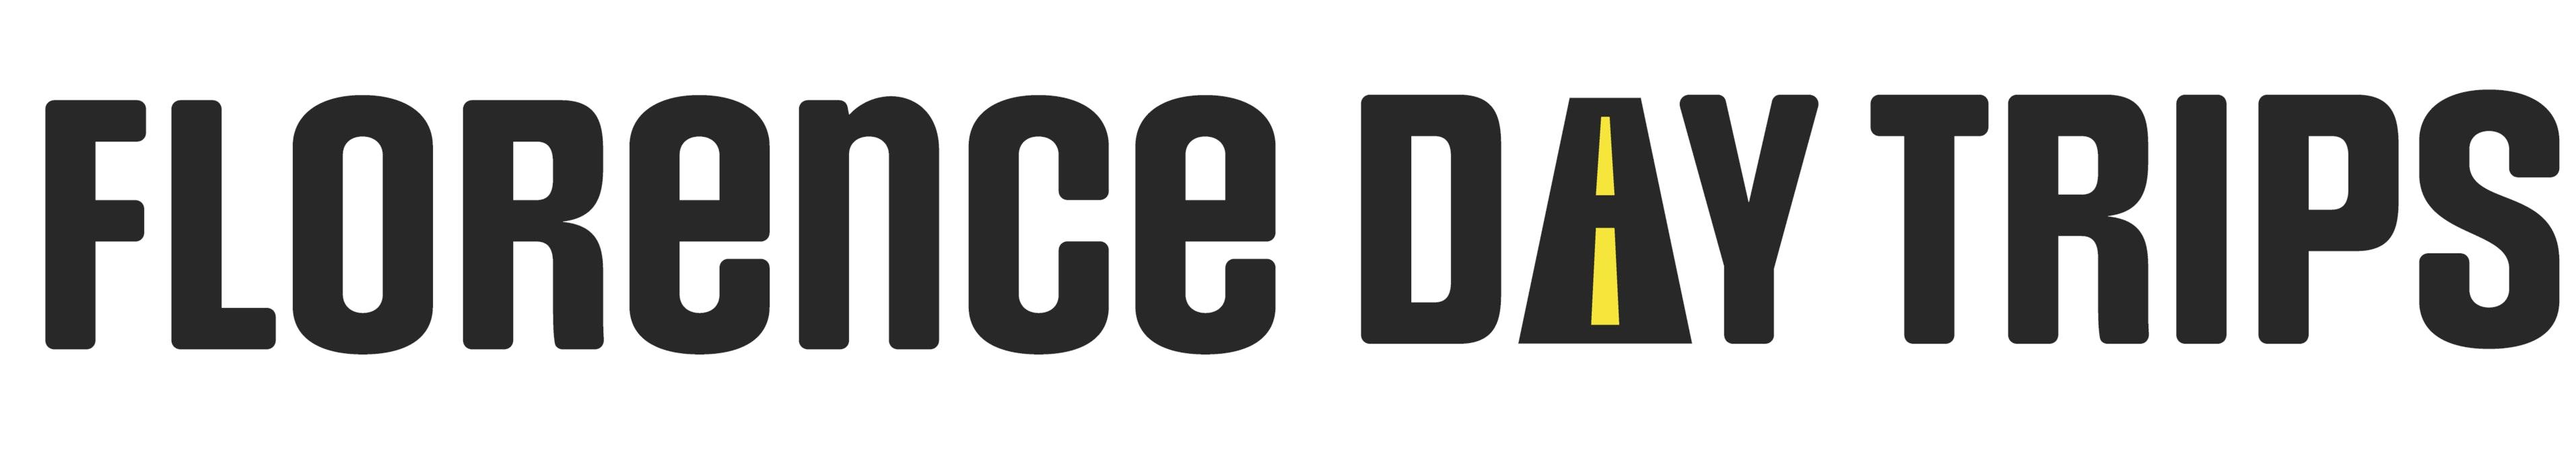 florence day trips logo